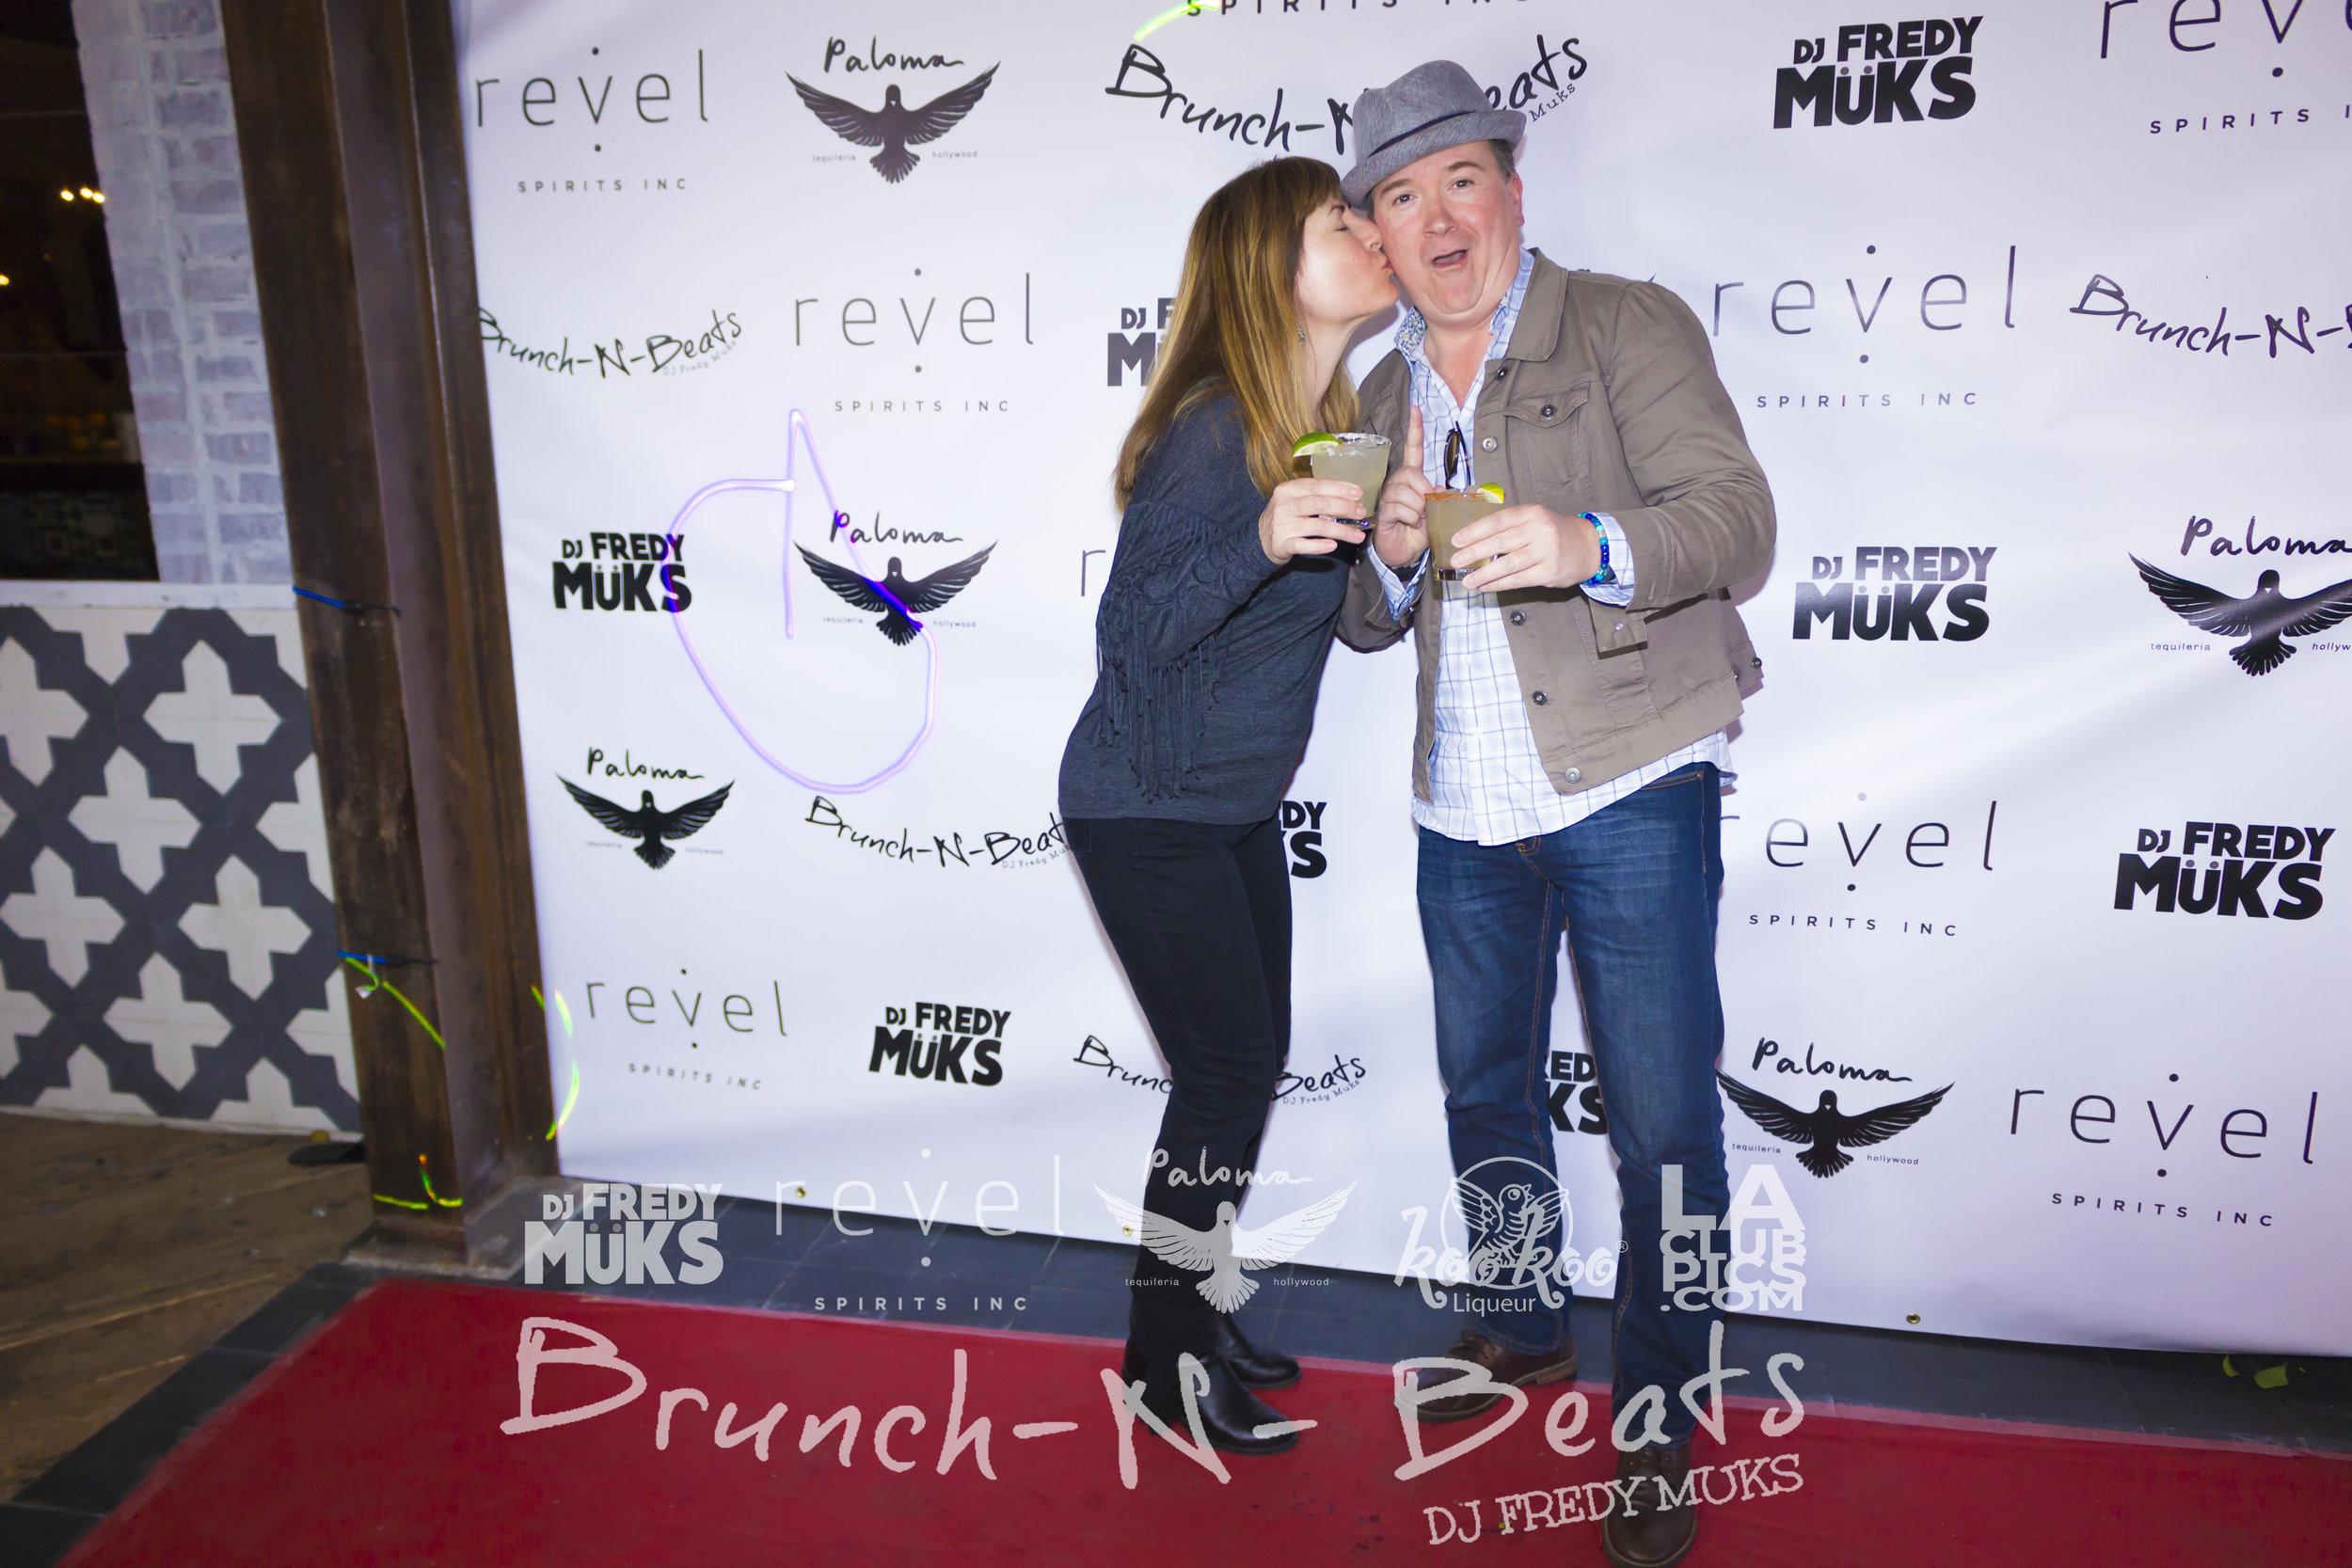 Brunch-N-Beats - Paloma Hollywood - 02-25-18_119.jpg